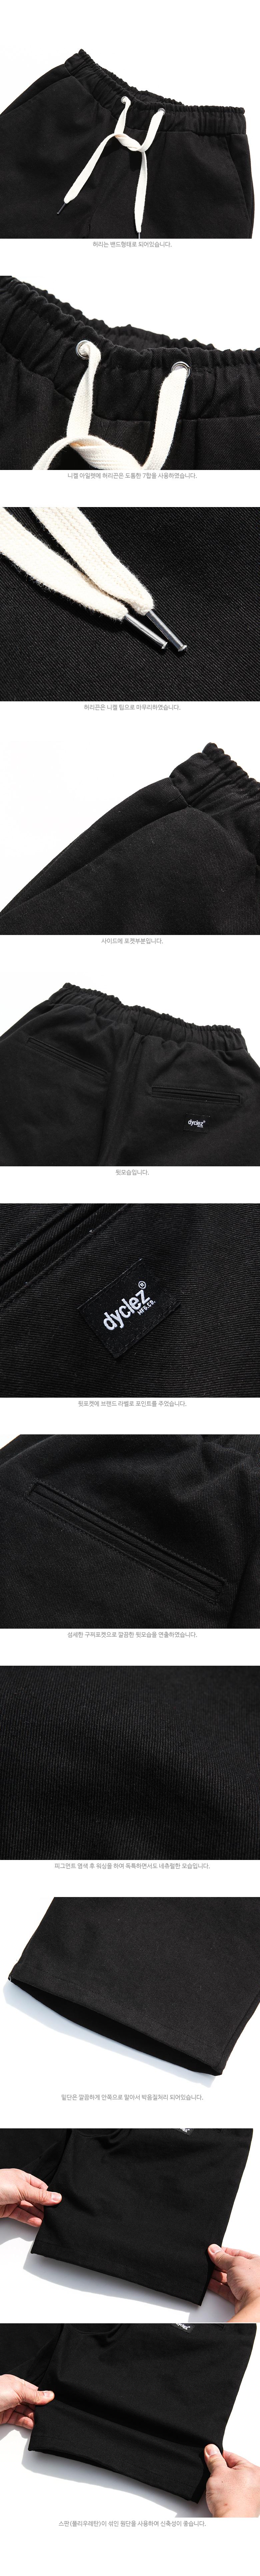 20190319_dy_pigmentshort_detail_black_02.jpg